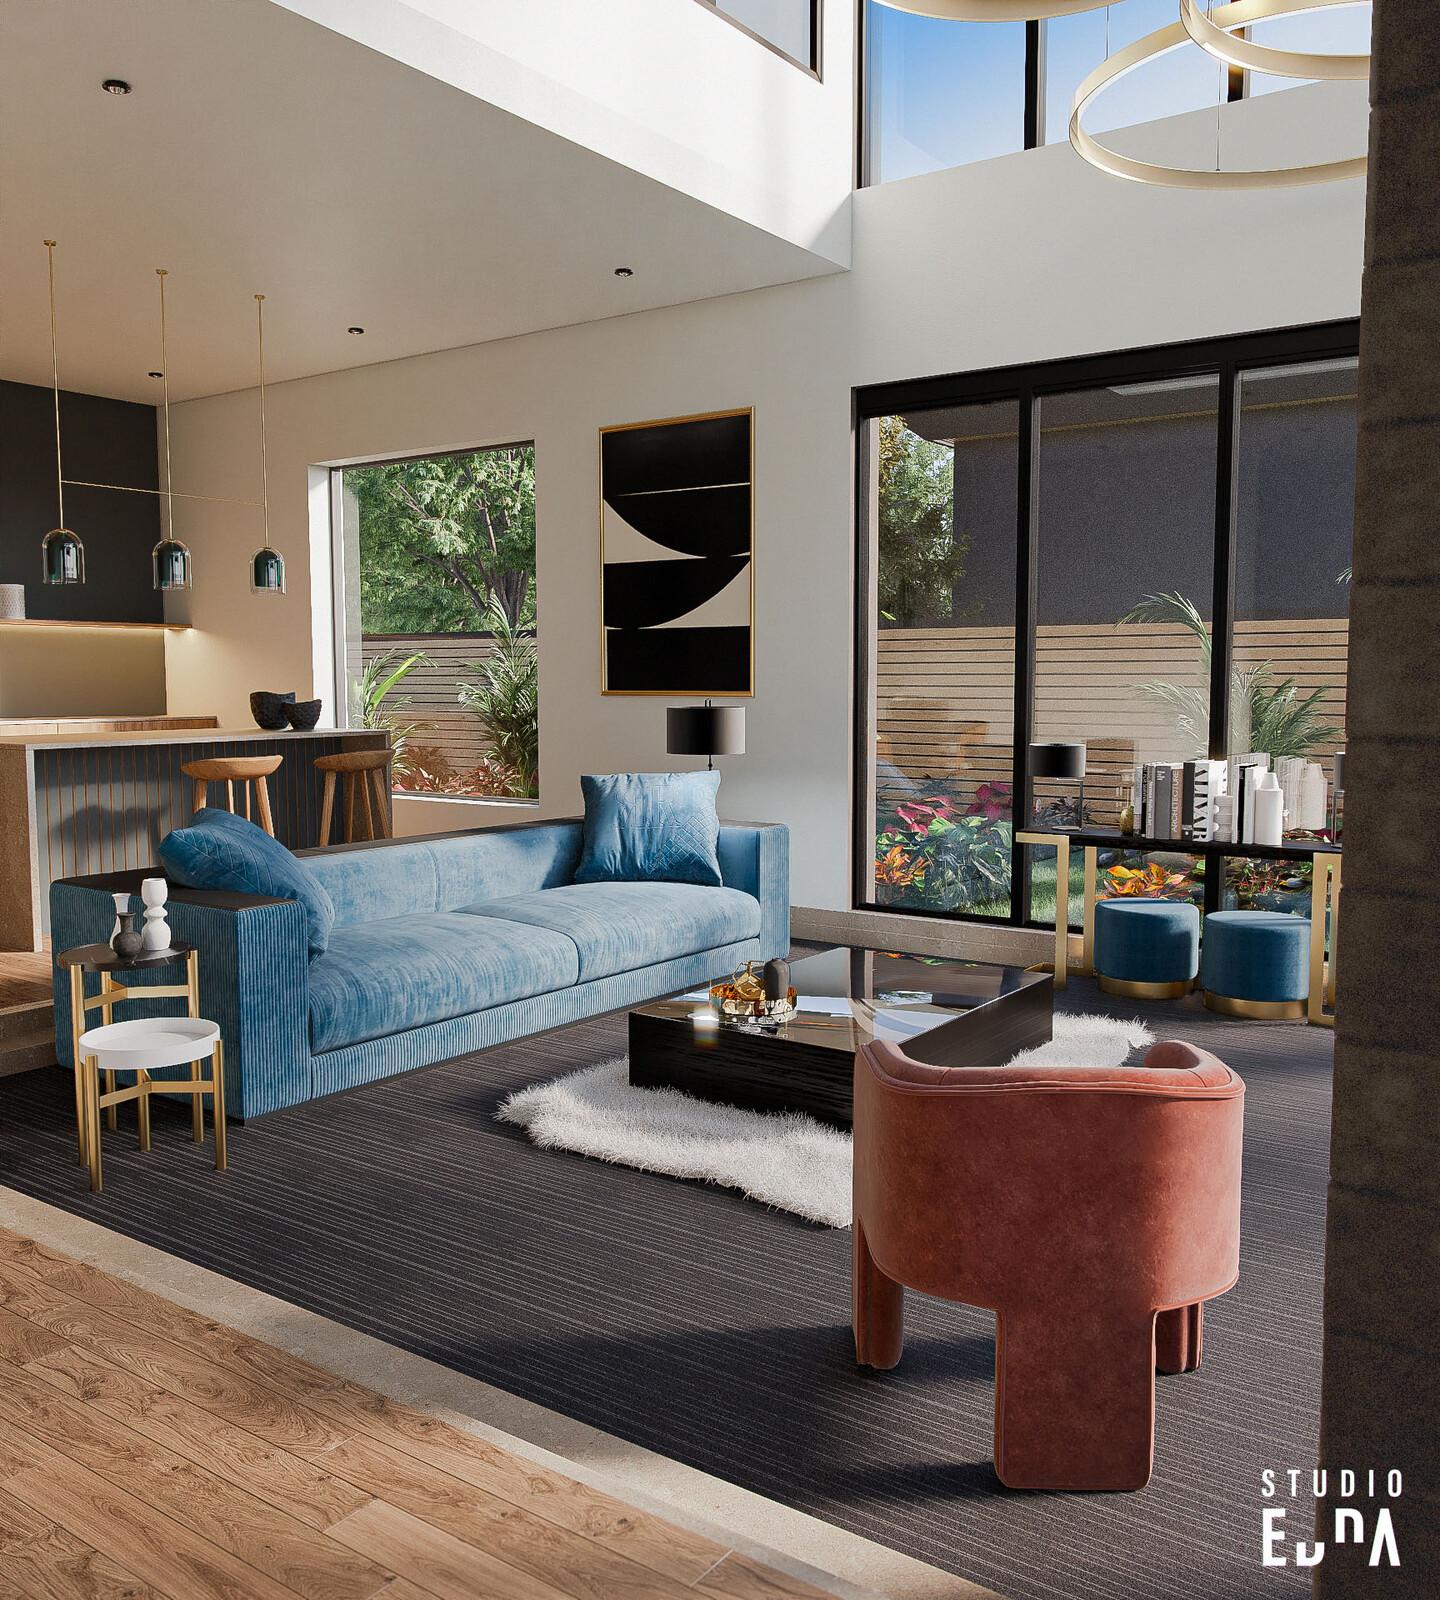 CG Interior - Villa Ridgeview Country Estates